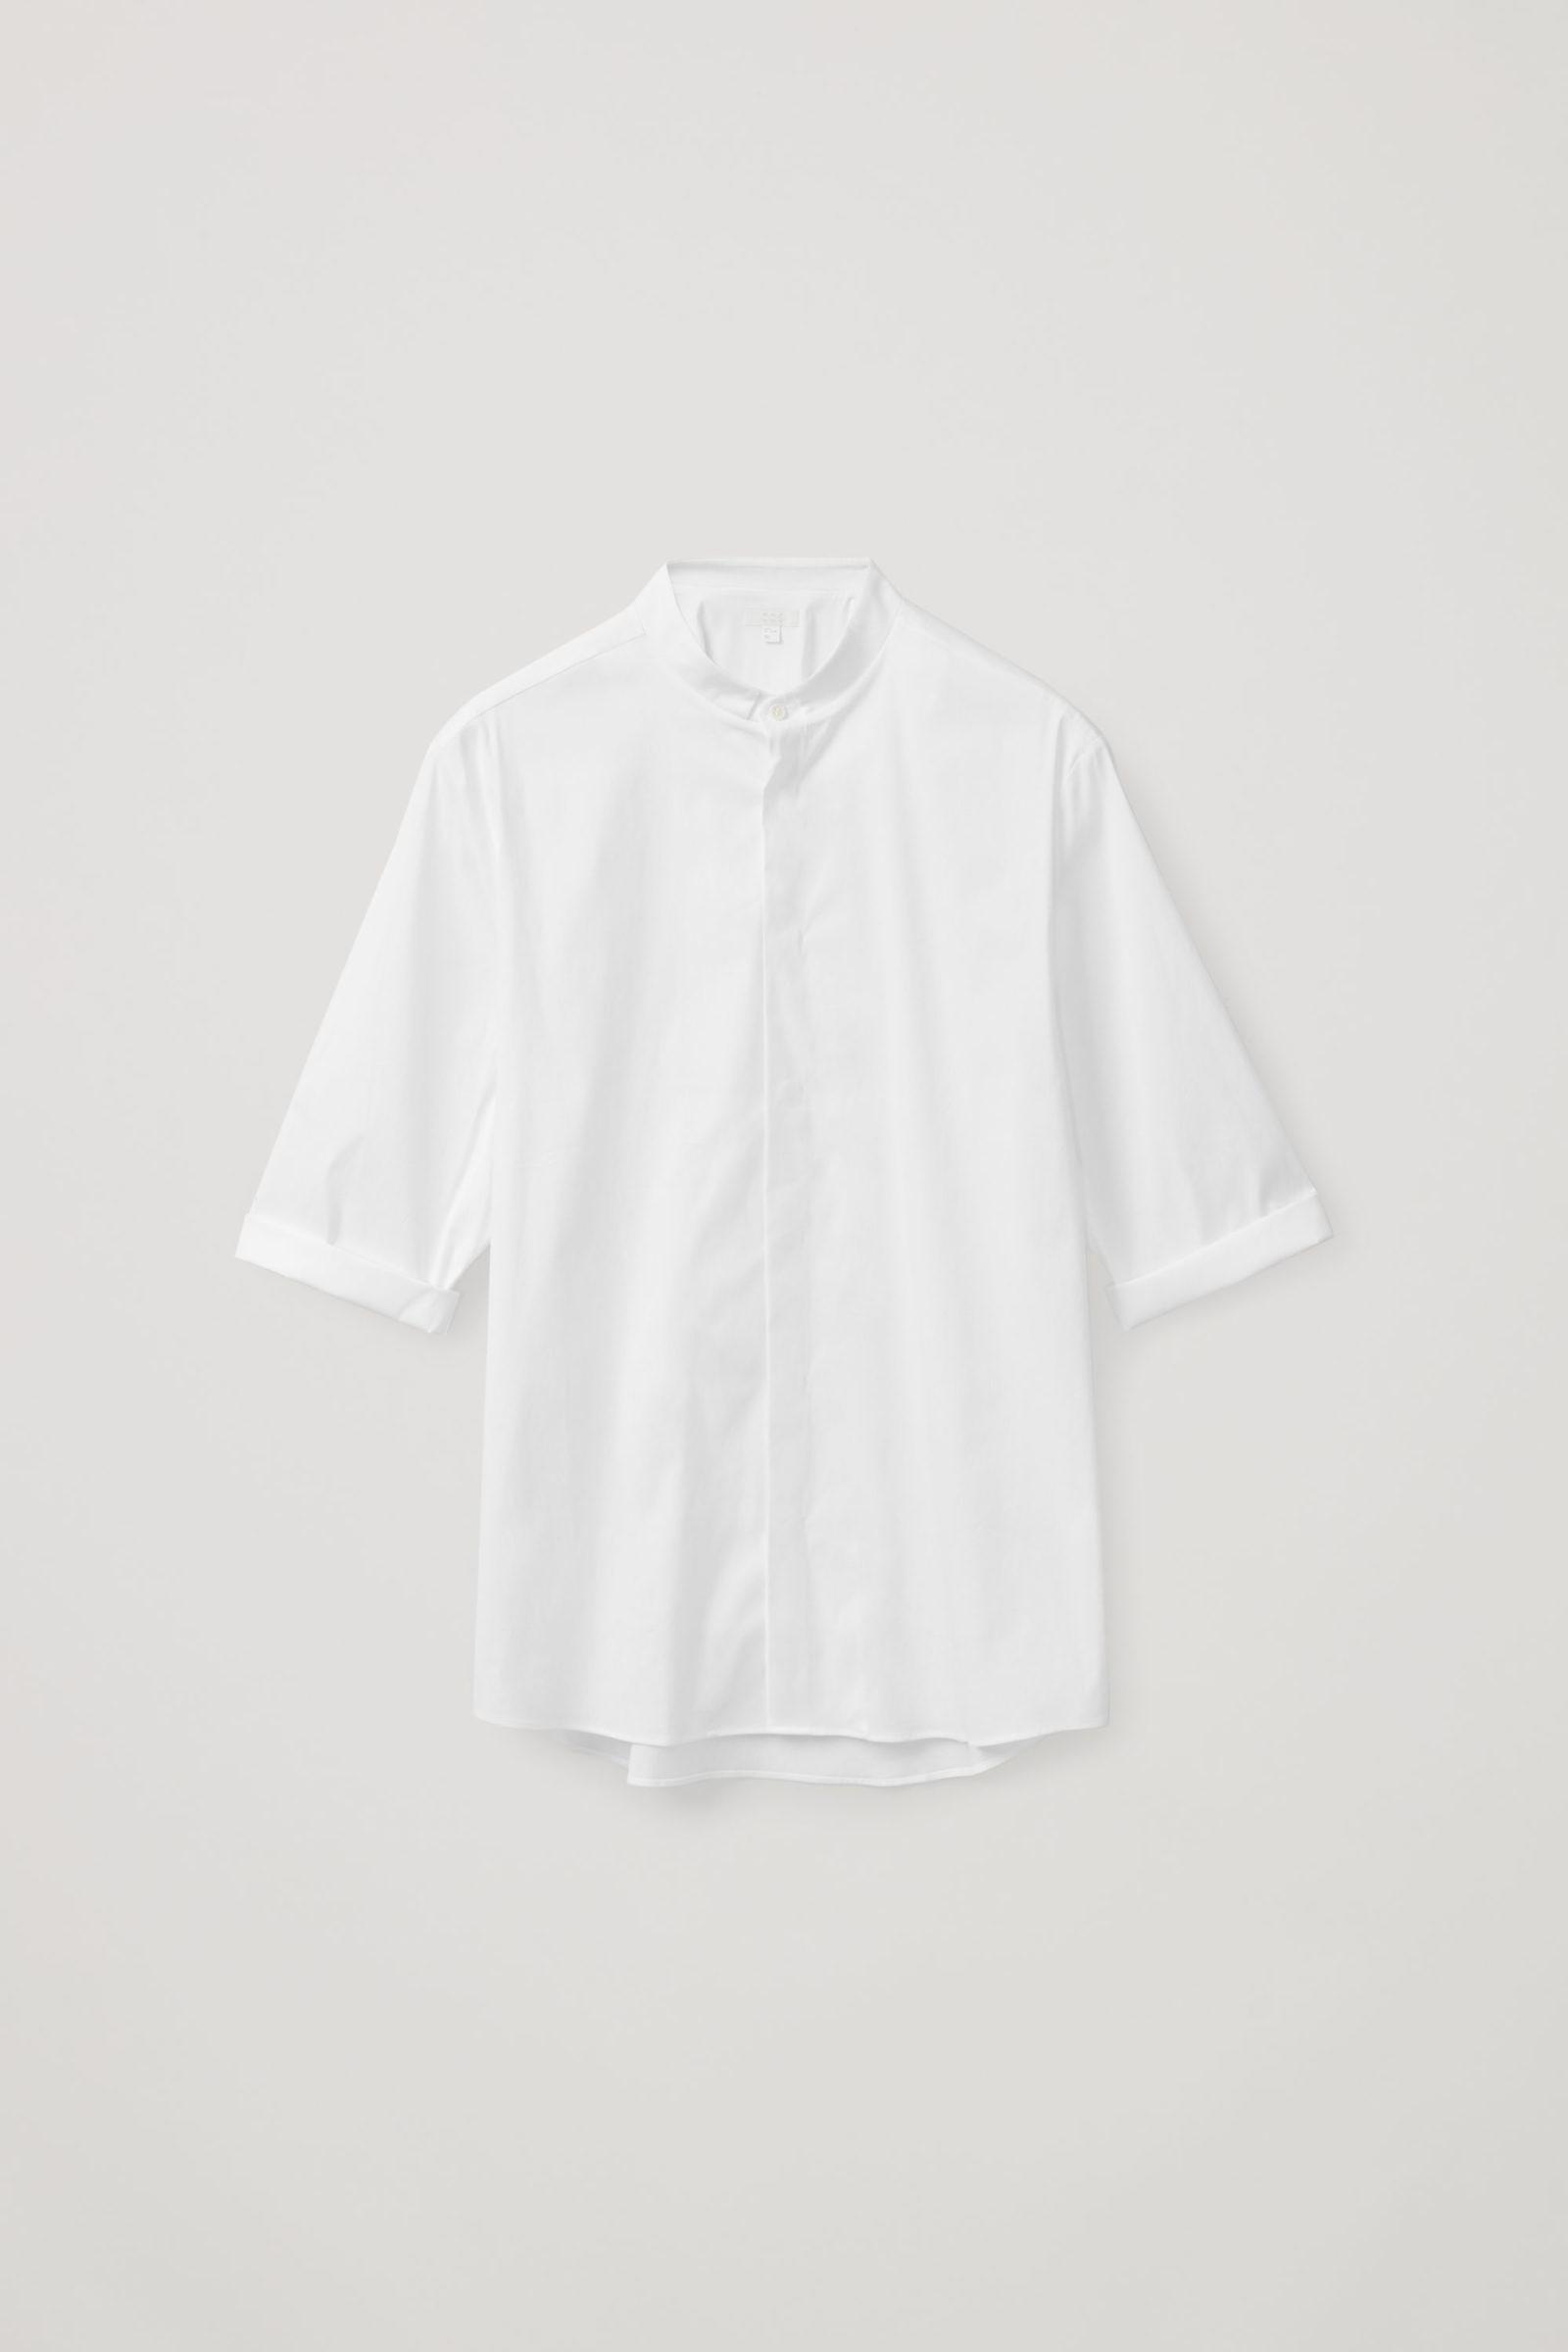 COS 슬림 칼라리스 셔츠의 화이트컬러 Product입니다.